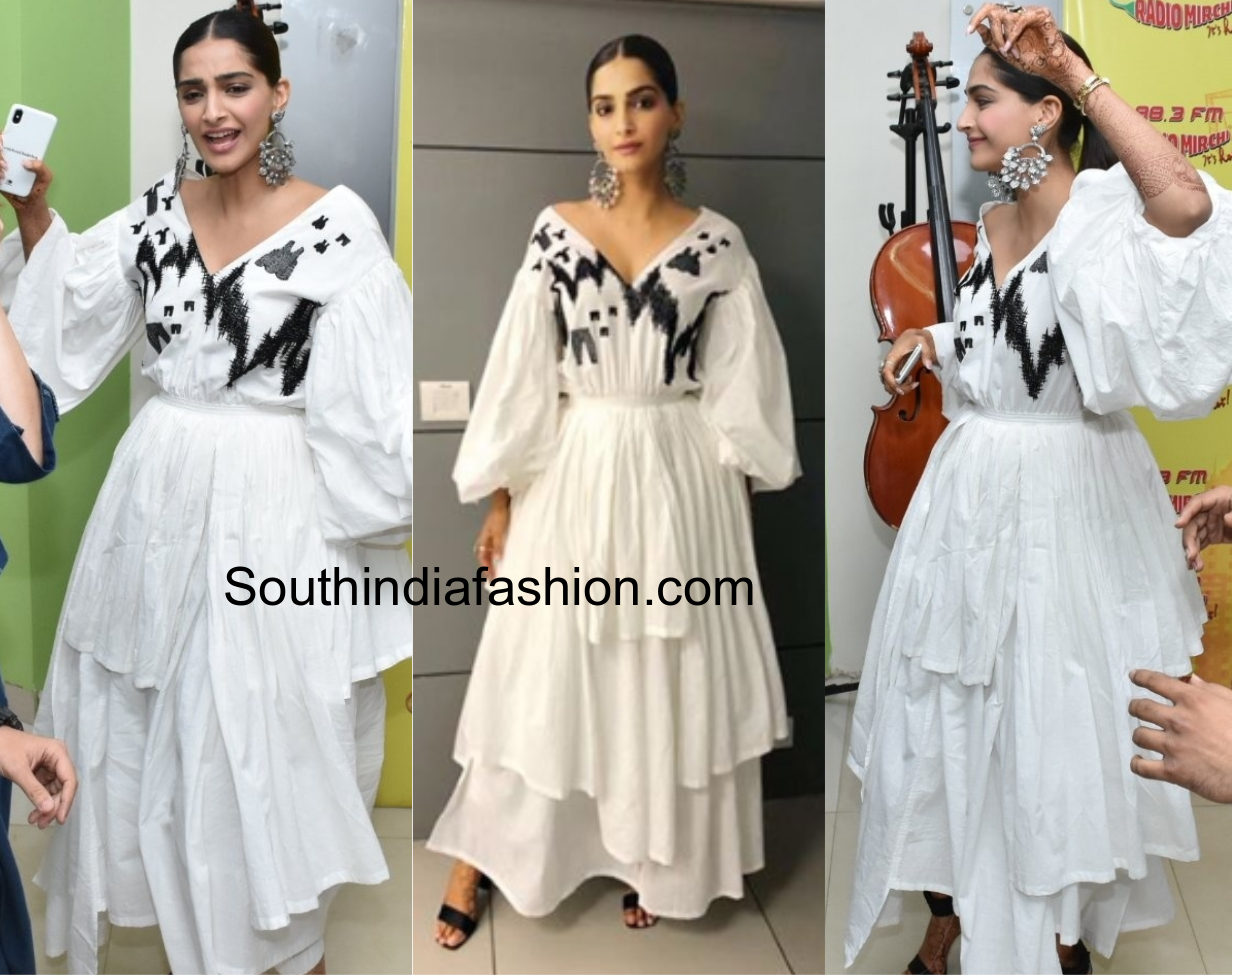 Veere Di Wedding Outfits.Sonam S Sensuous Looks For Promotions Of Veere Di Wedding Closet